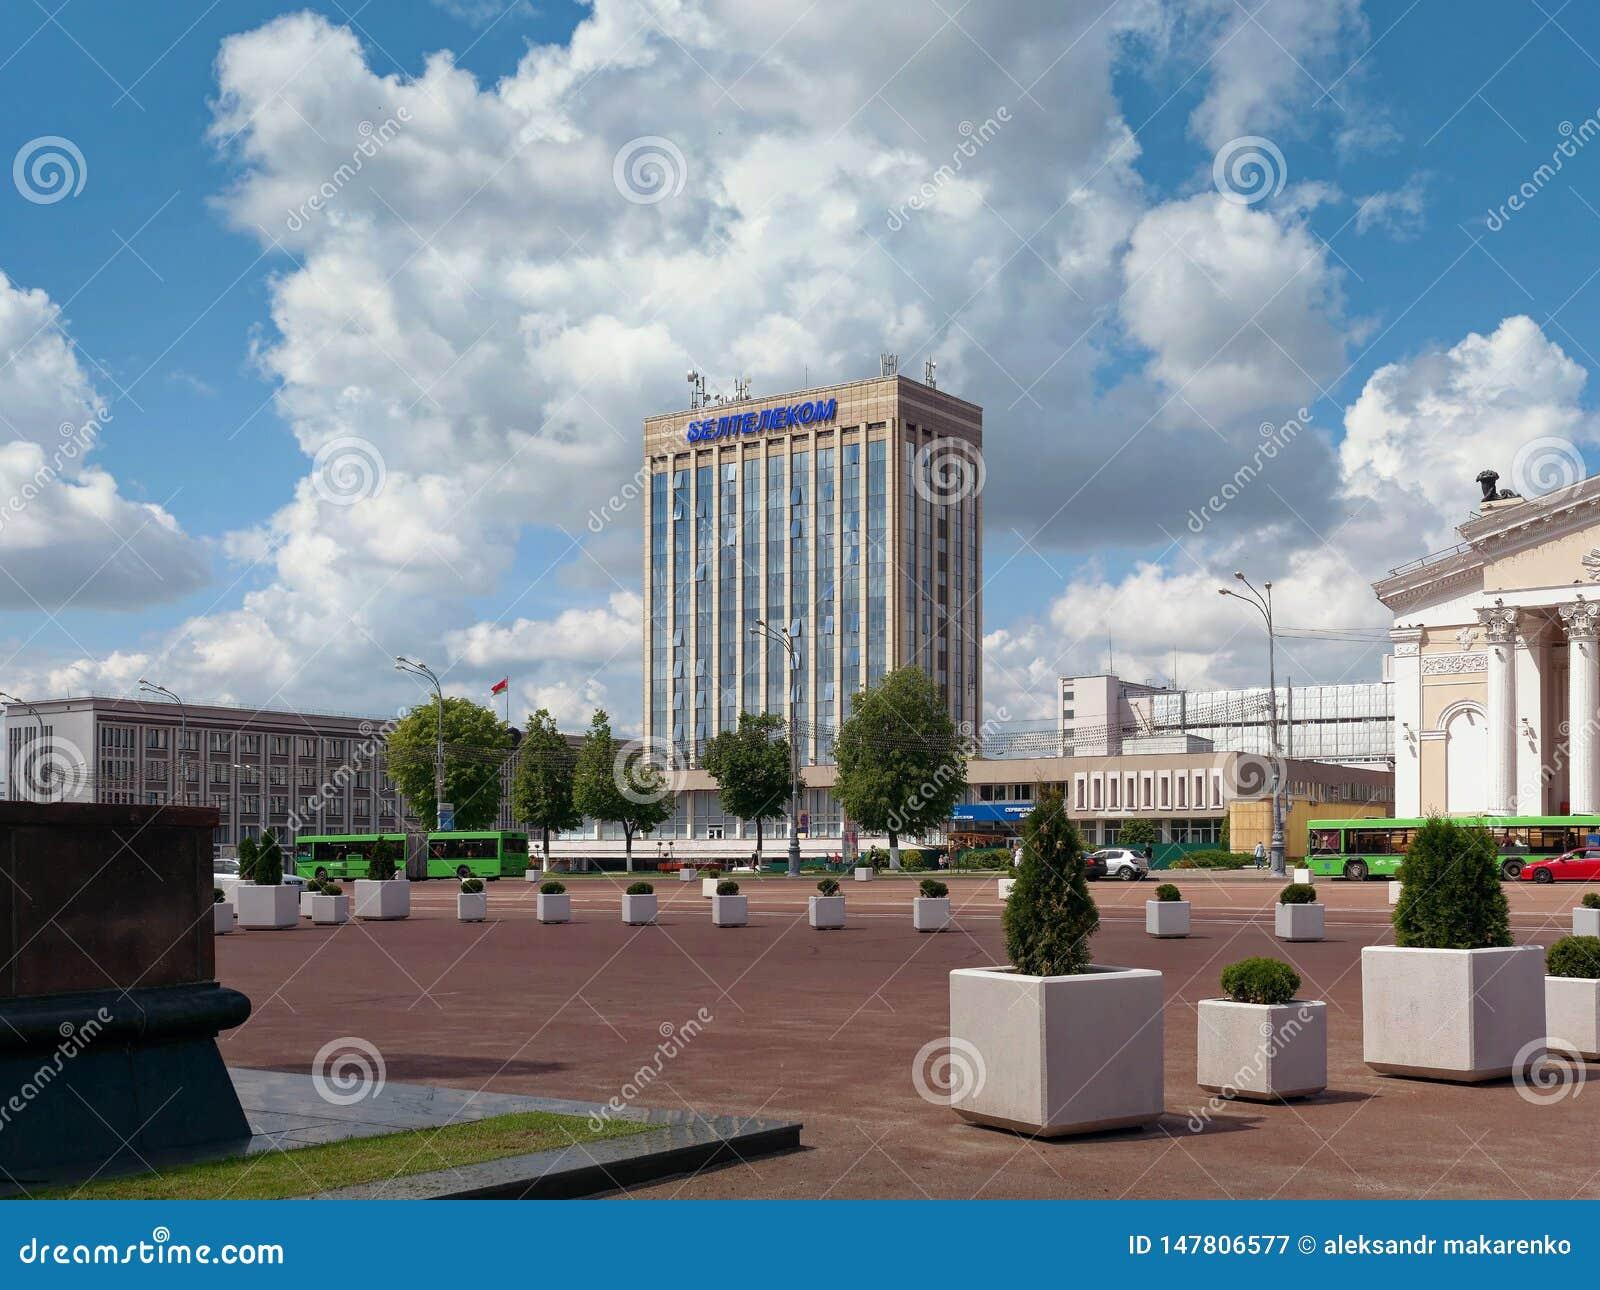 GOMEL, BELARUS - 15 MAI 2019 : Place de L?nine Th??tre et bureau de poste